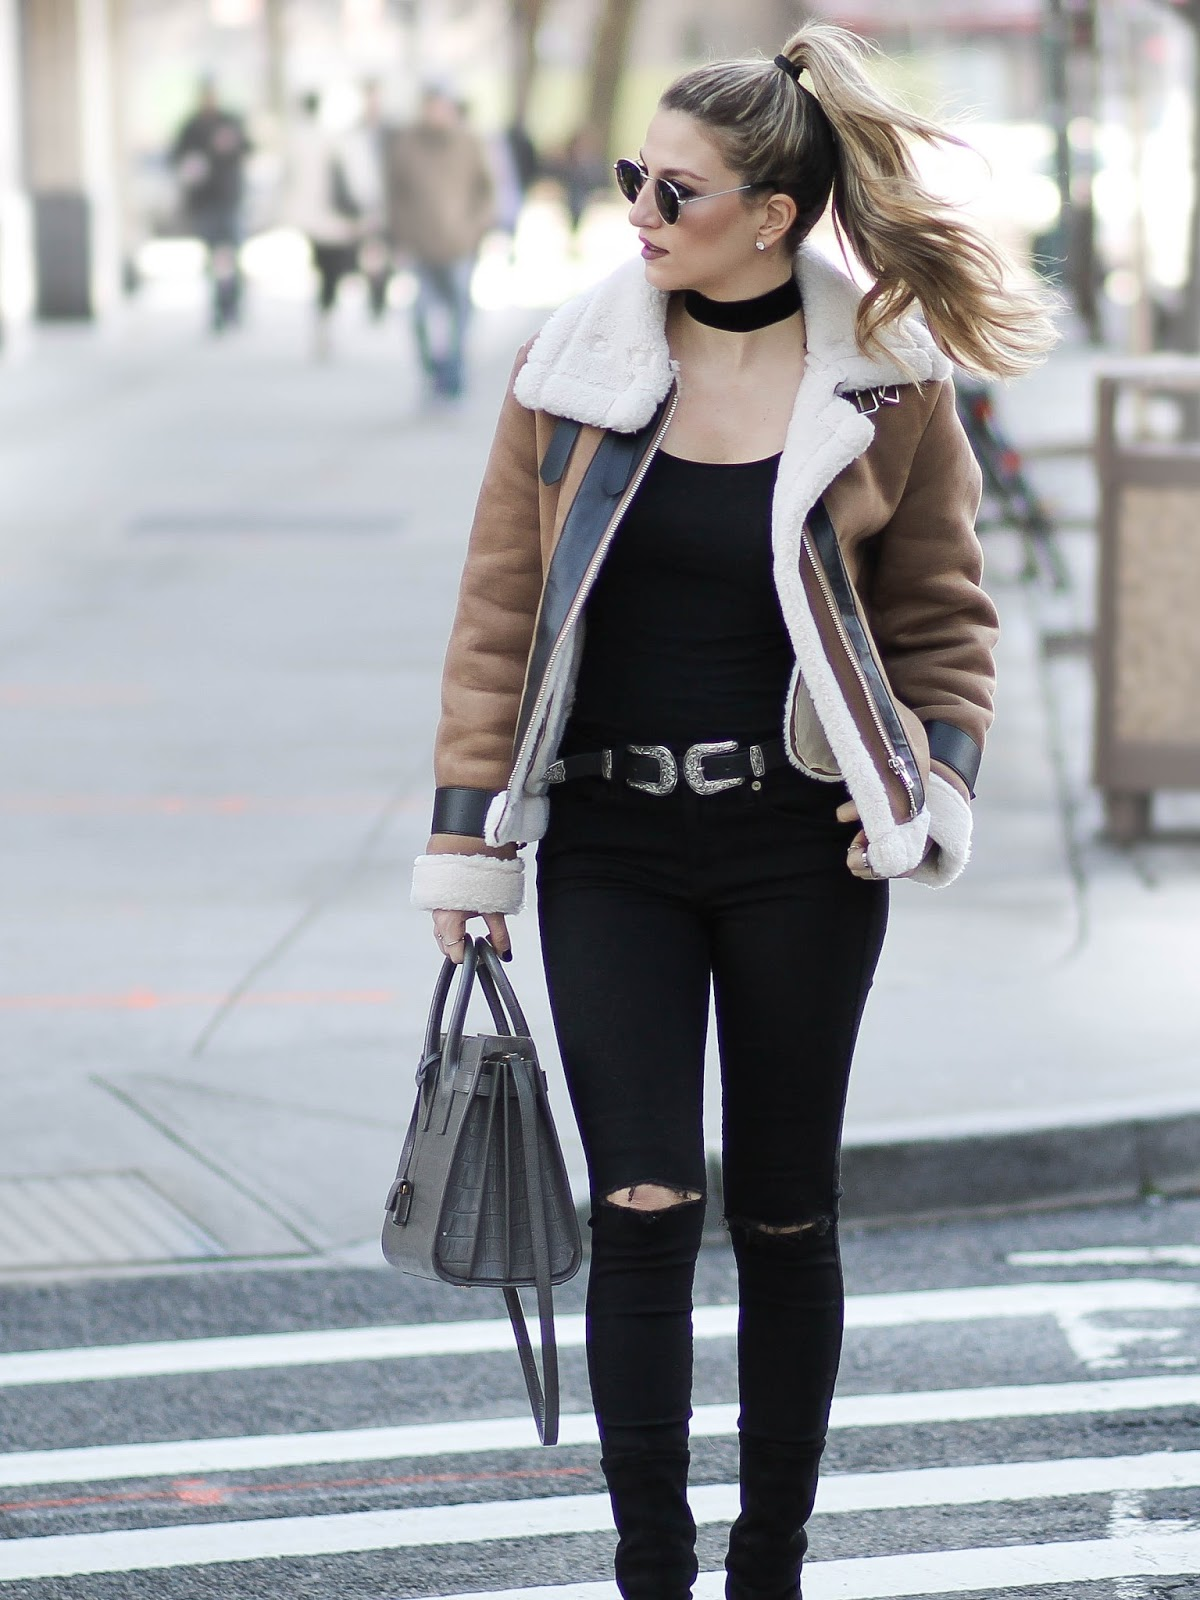 shearling-coat-dressed4dreams_5051-2 (2)